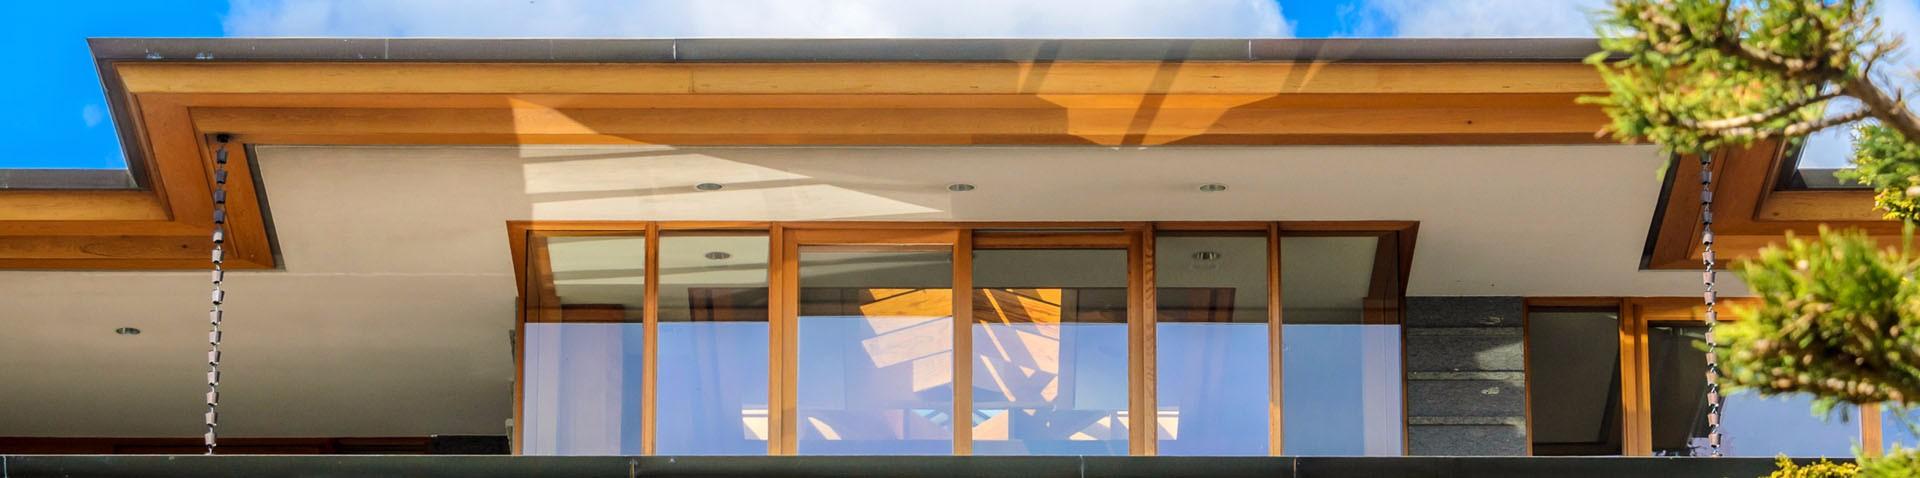 exterior-windows-banner